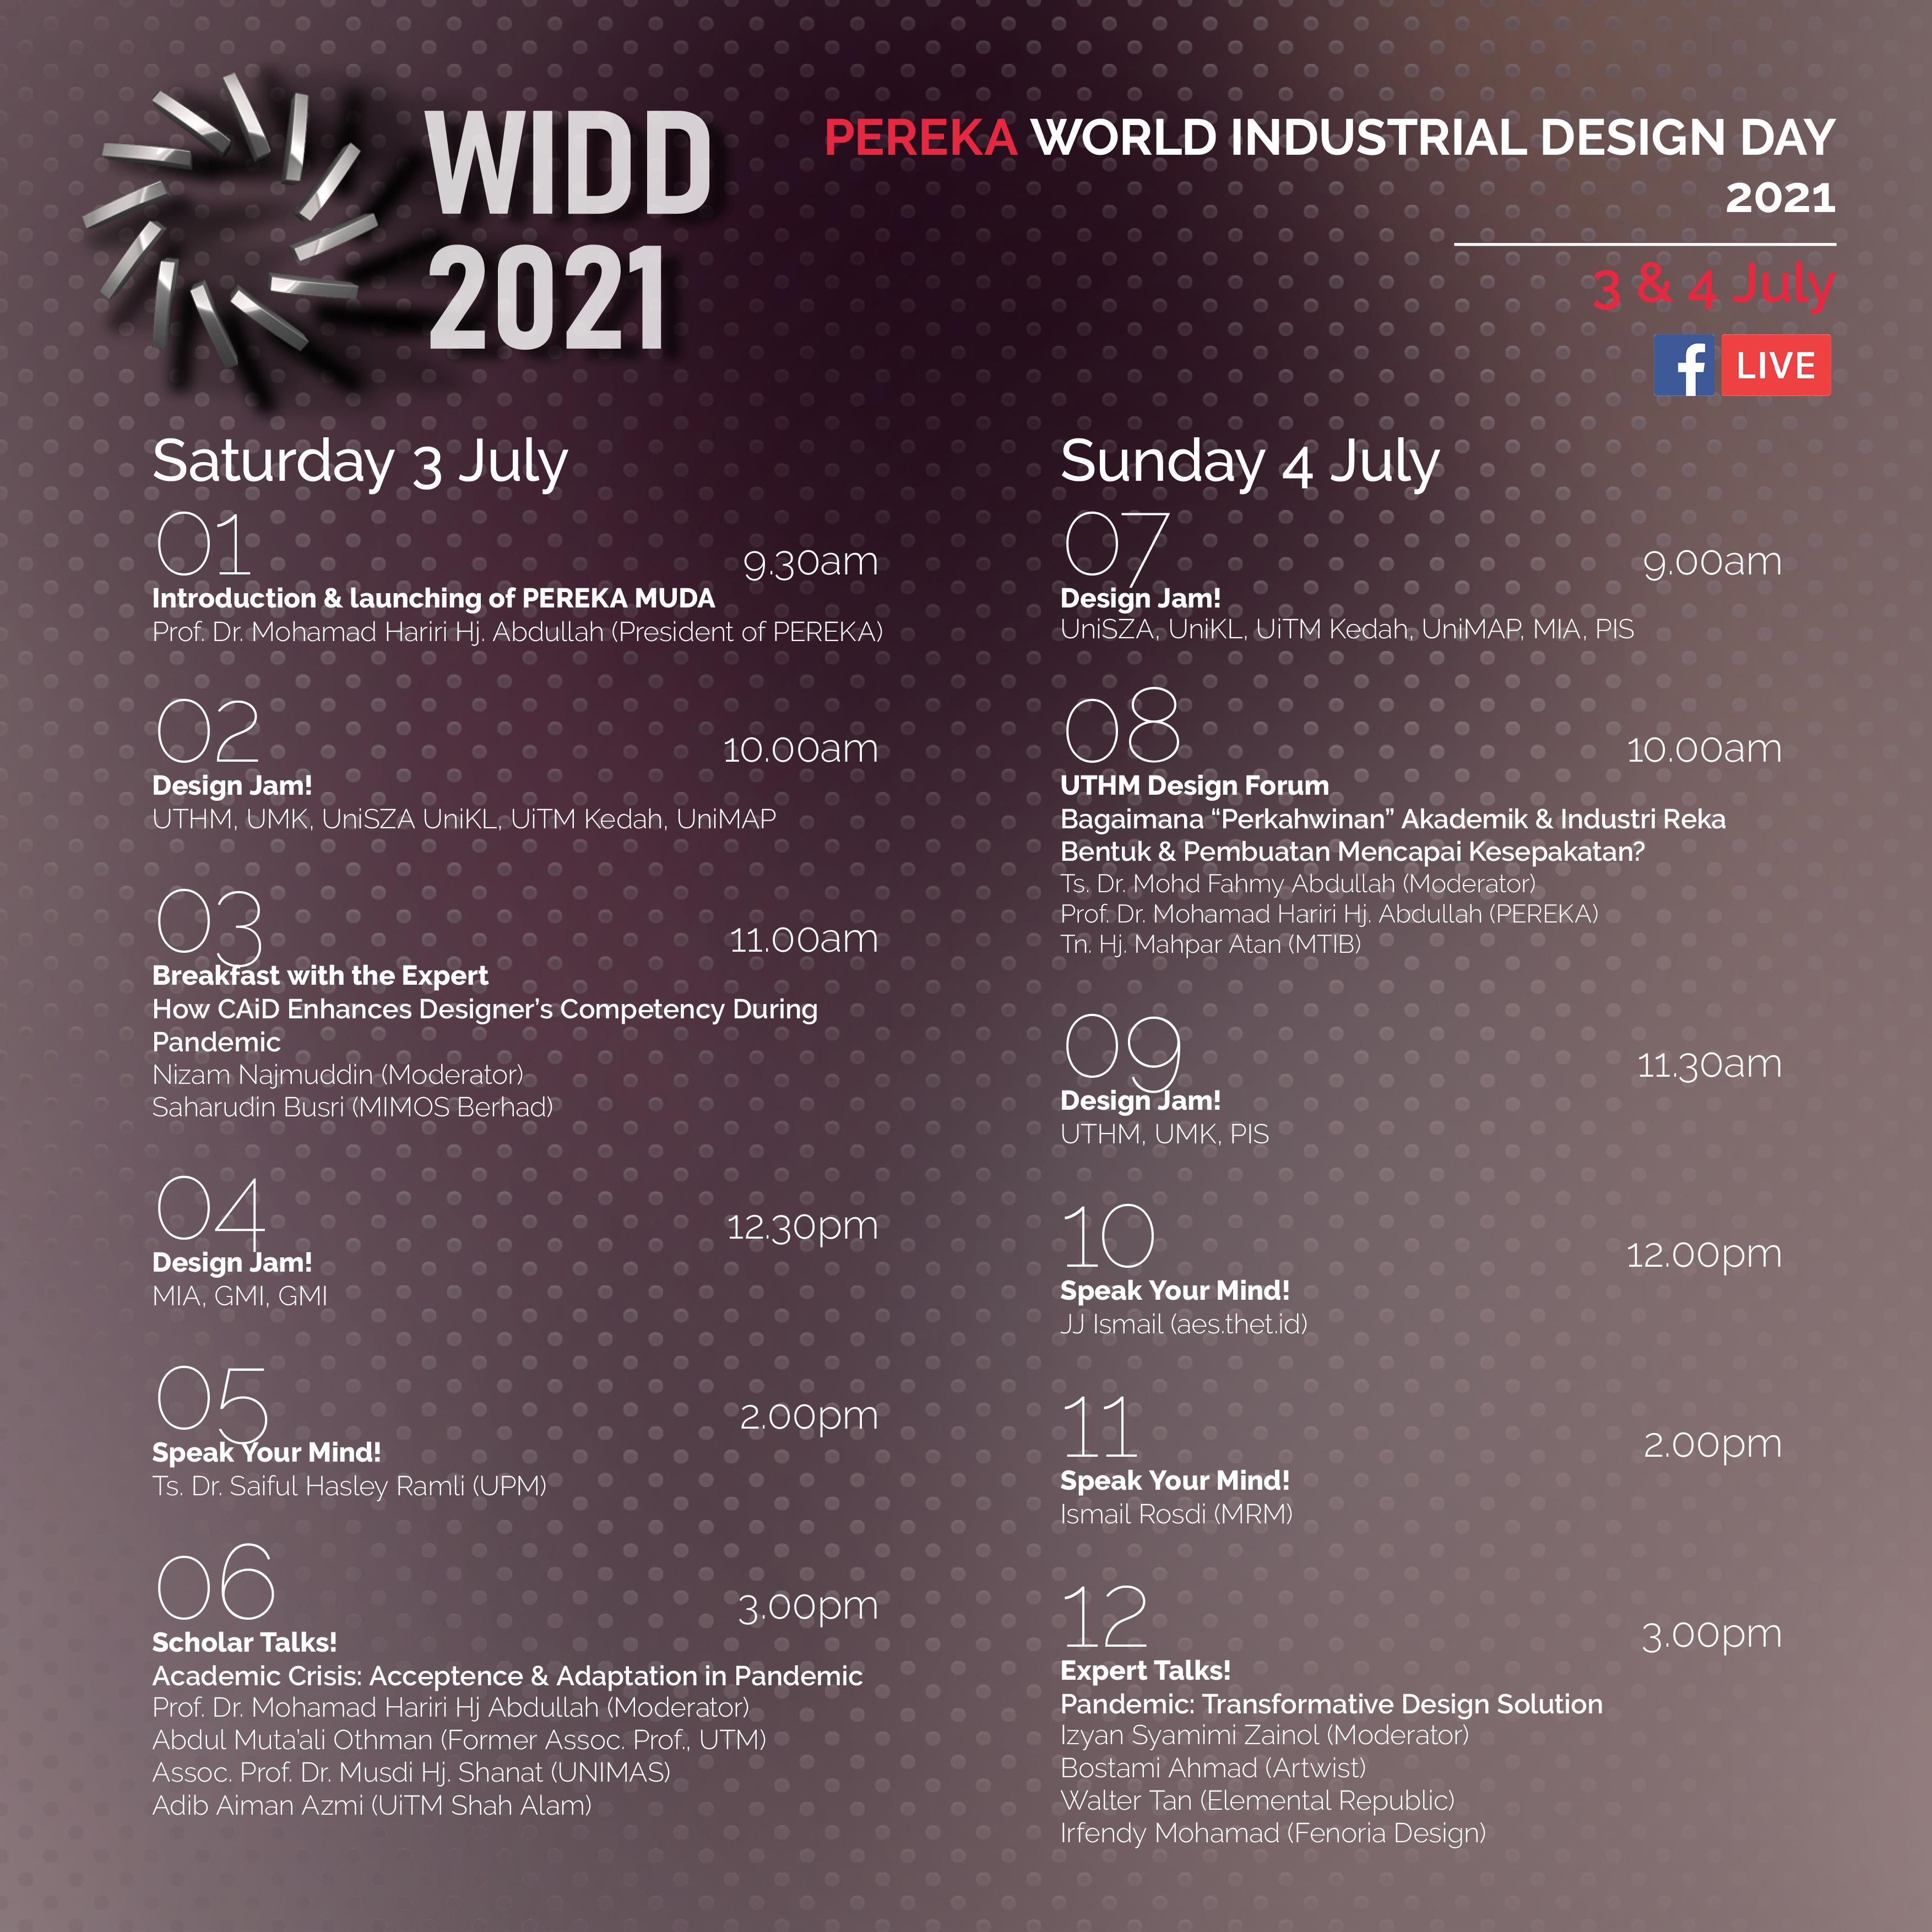 World Industrial Design Day 2021 Tentative